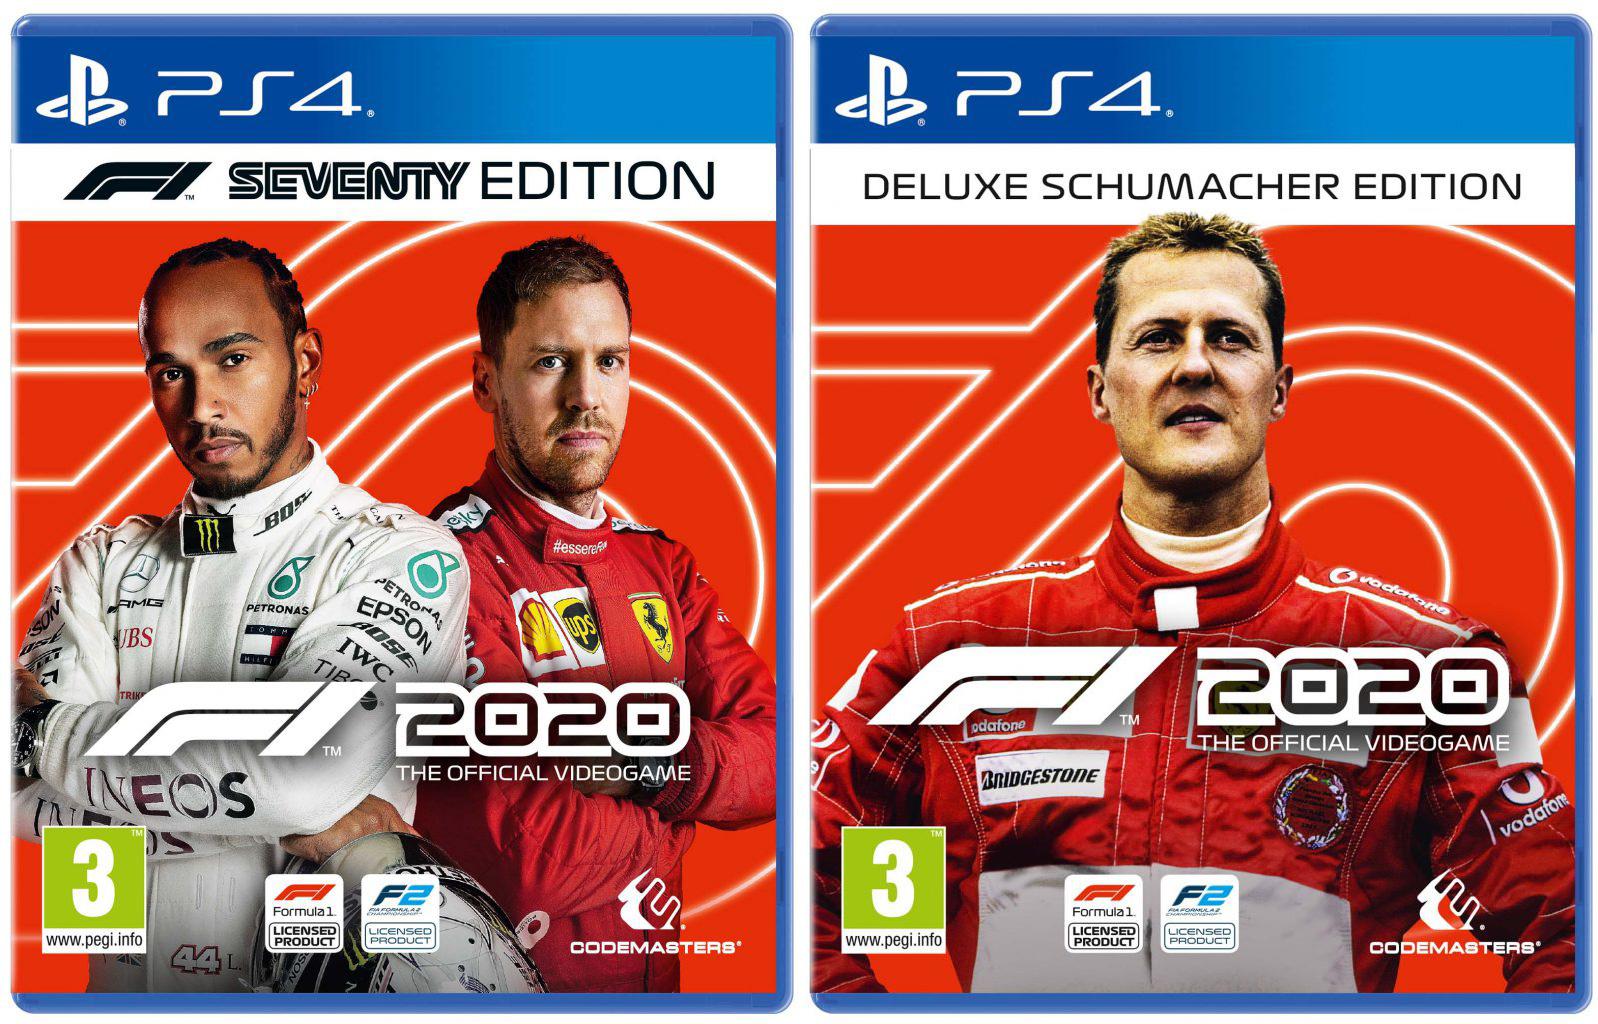 Codemasters Reveal Zandvoort F1 2020 Video Lap And Game Artwork Racefans